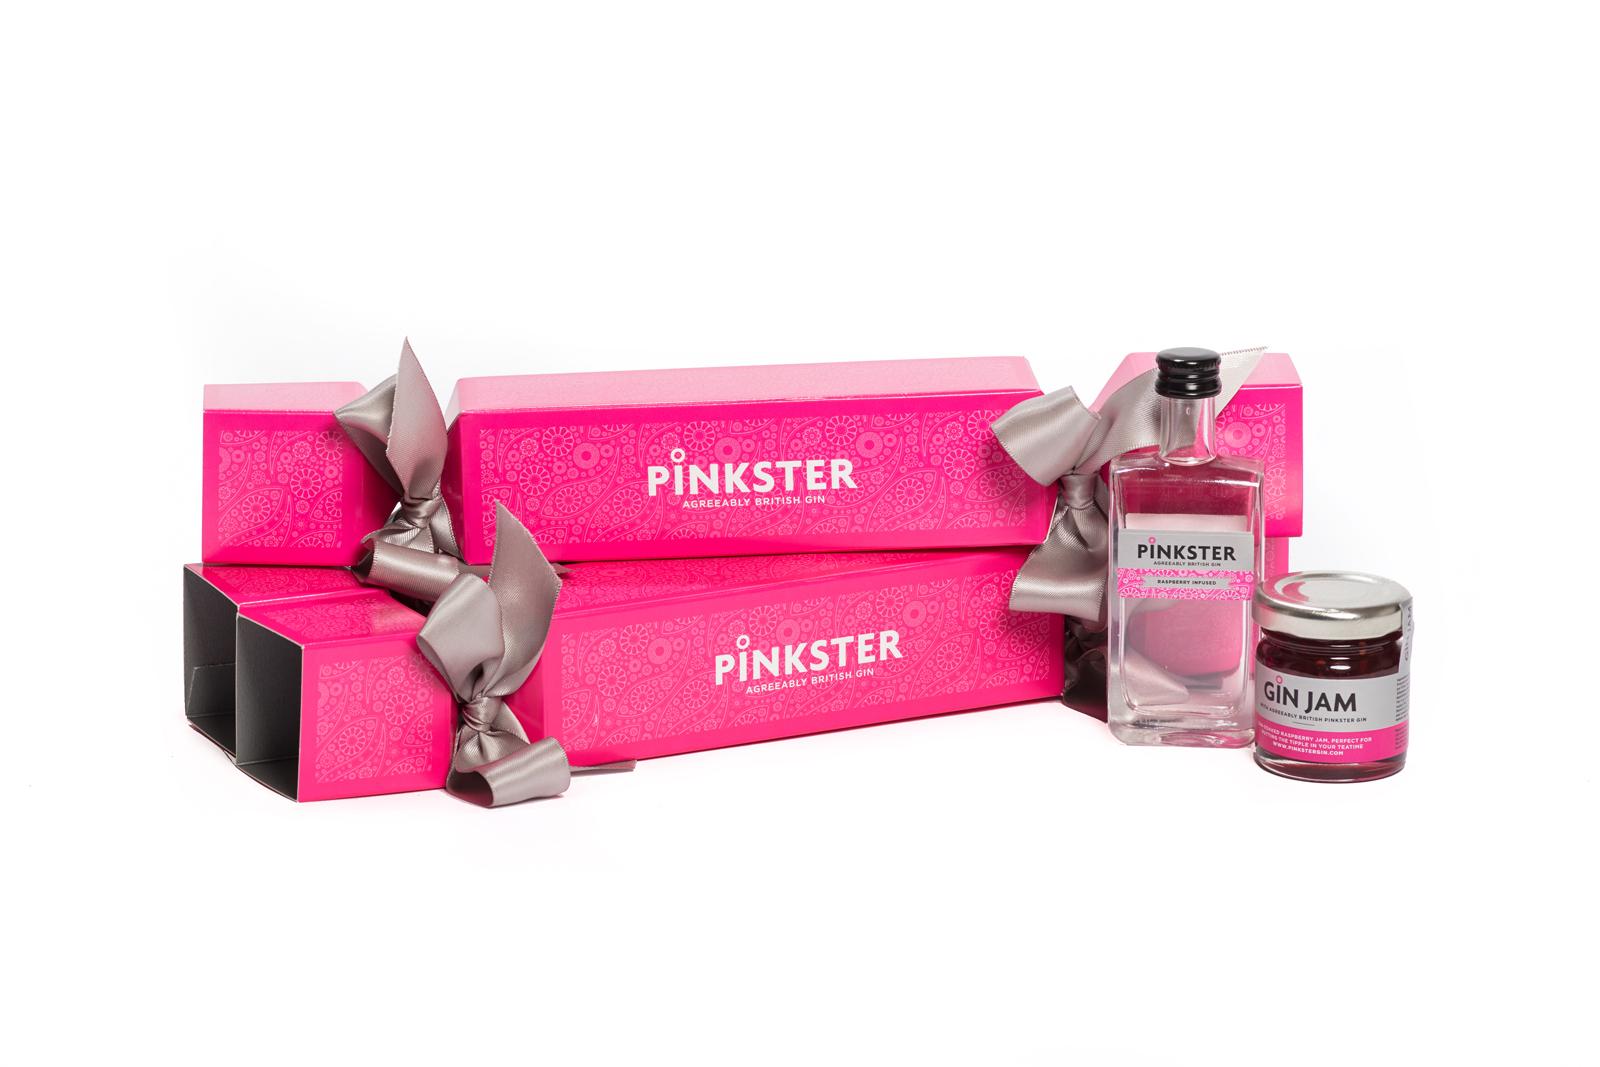 The Pinkster Miniature Gift Set x1